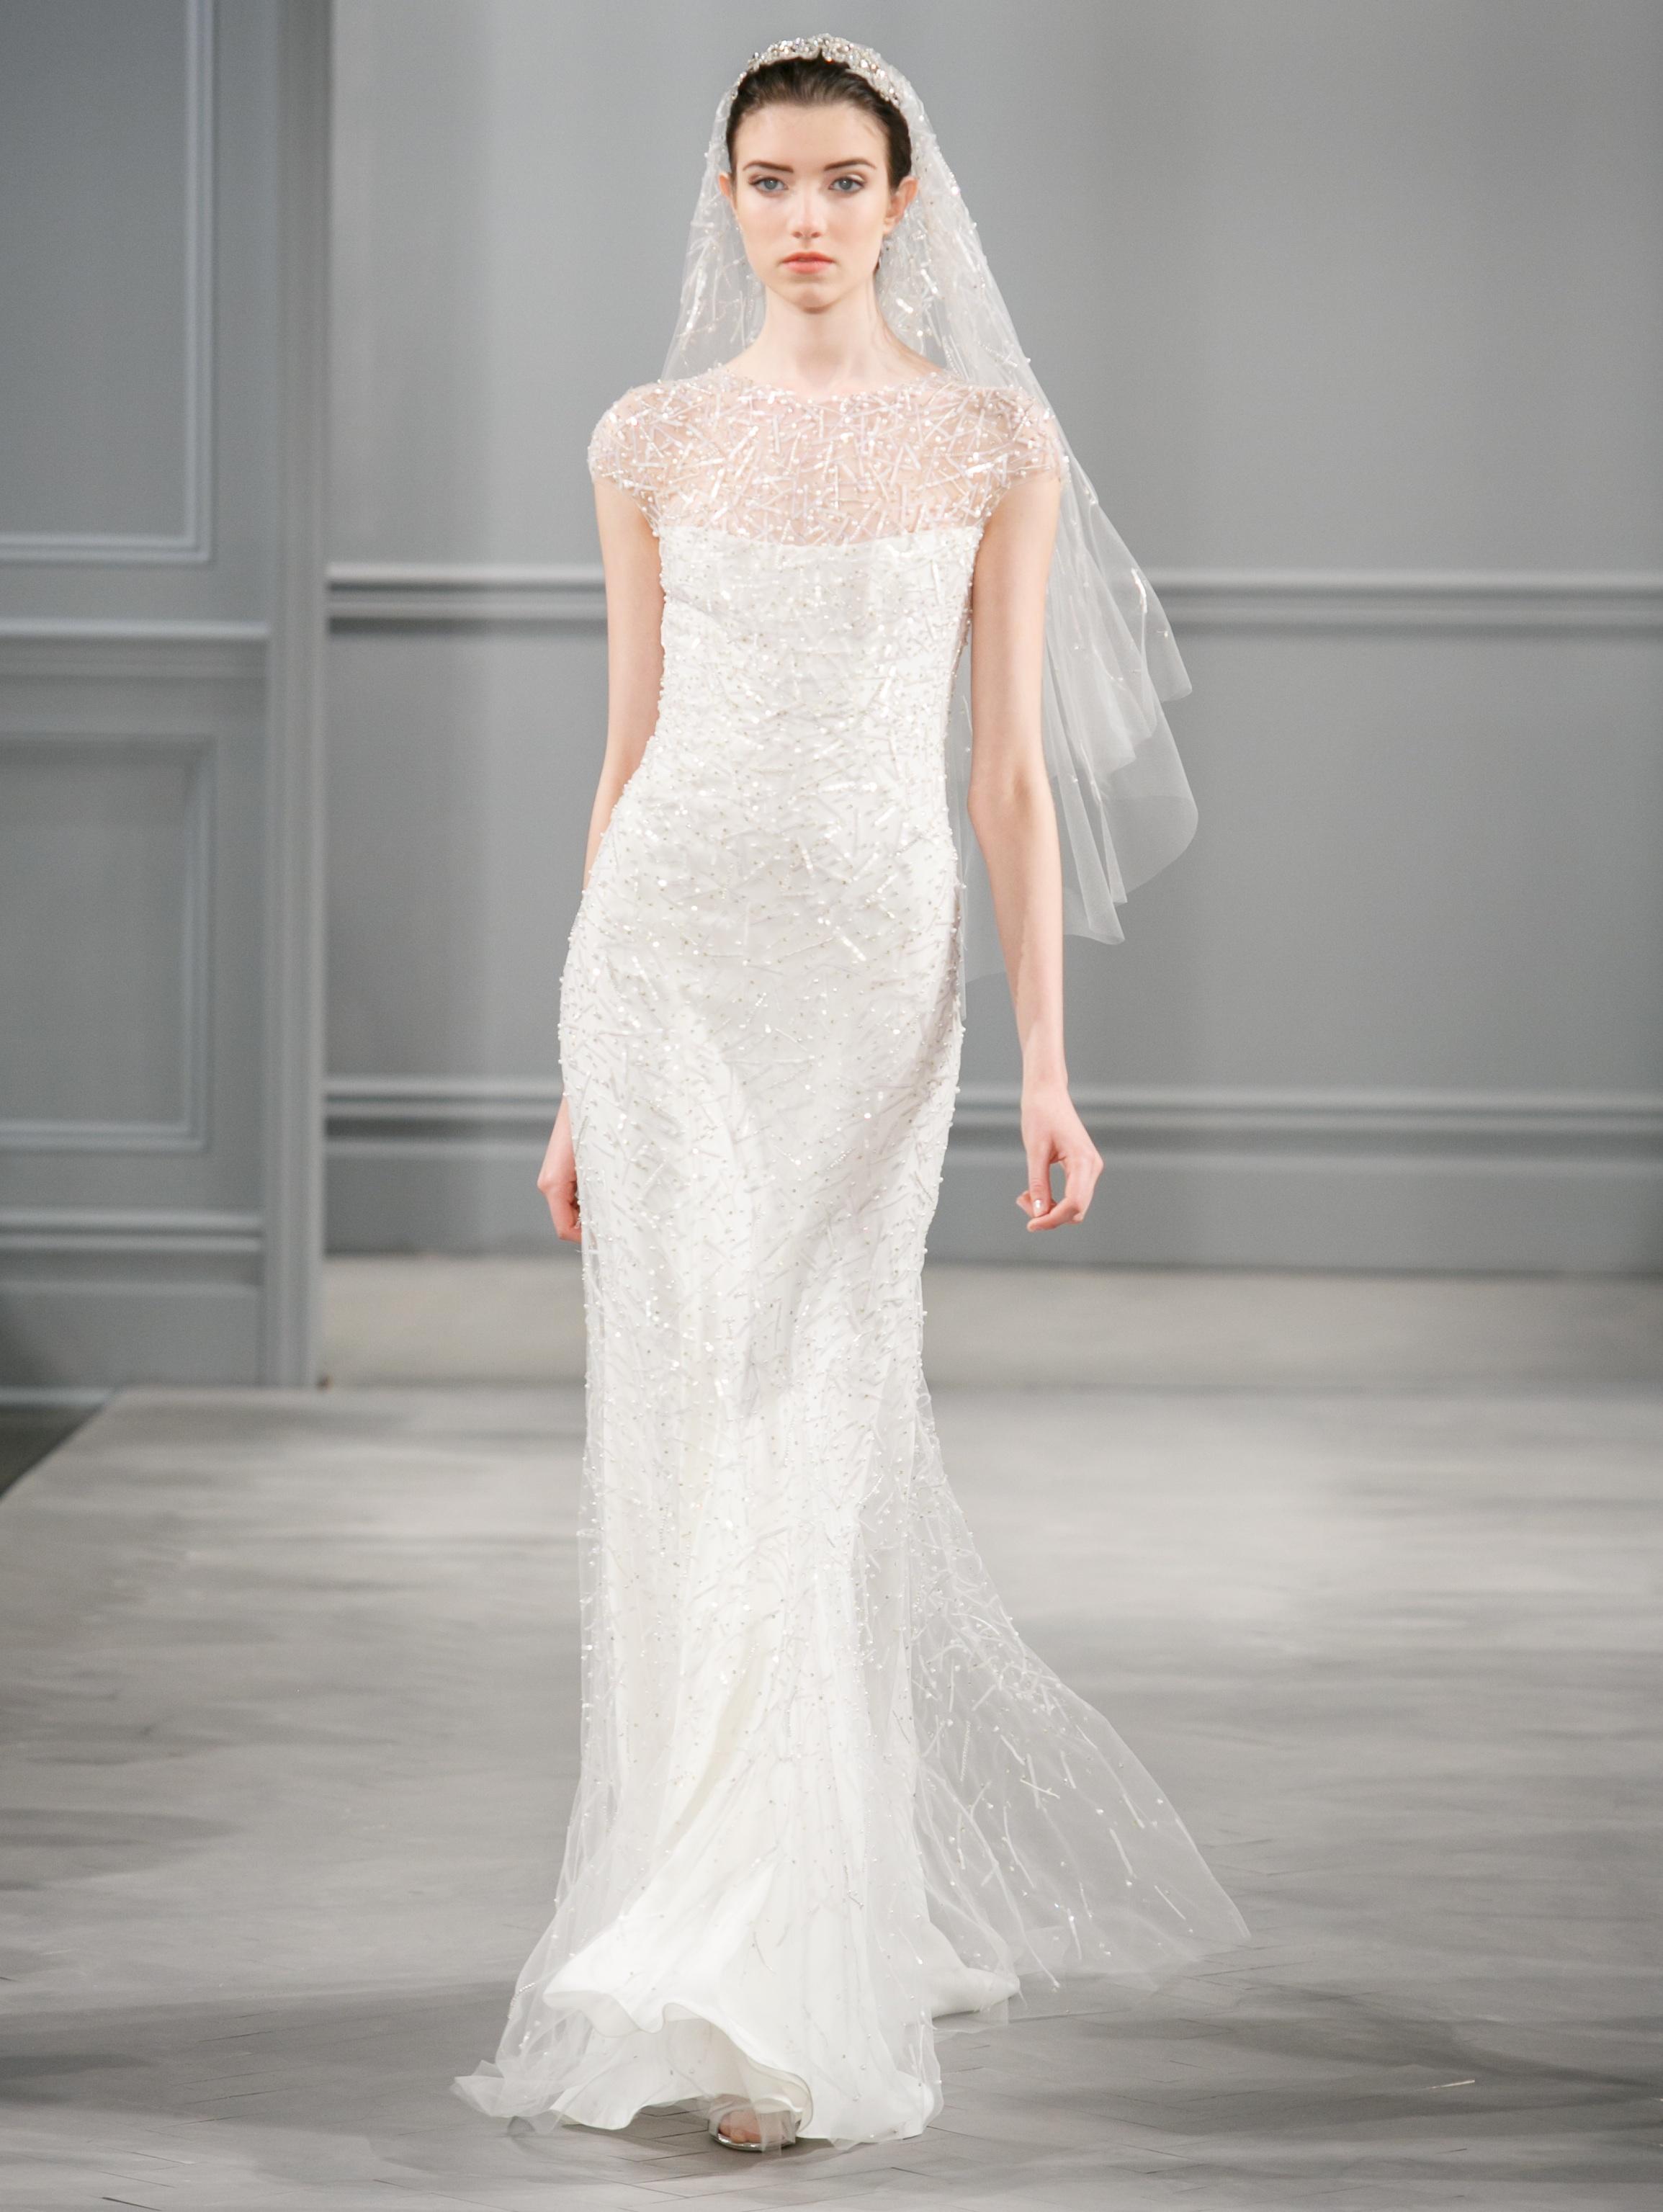 Spring 2014 wedding dress monique lhuillier bridal for Buy monique lhuillier wedding dress